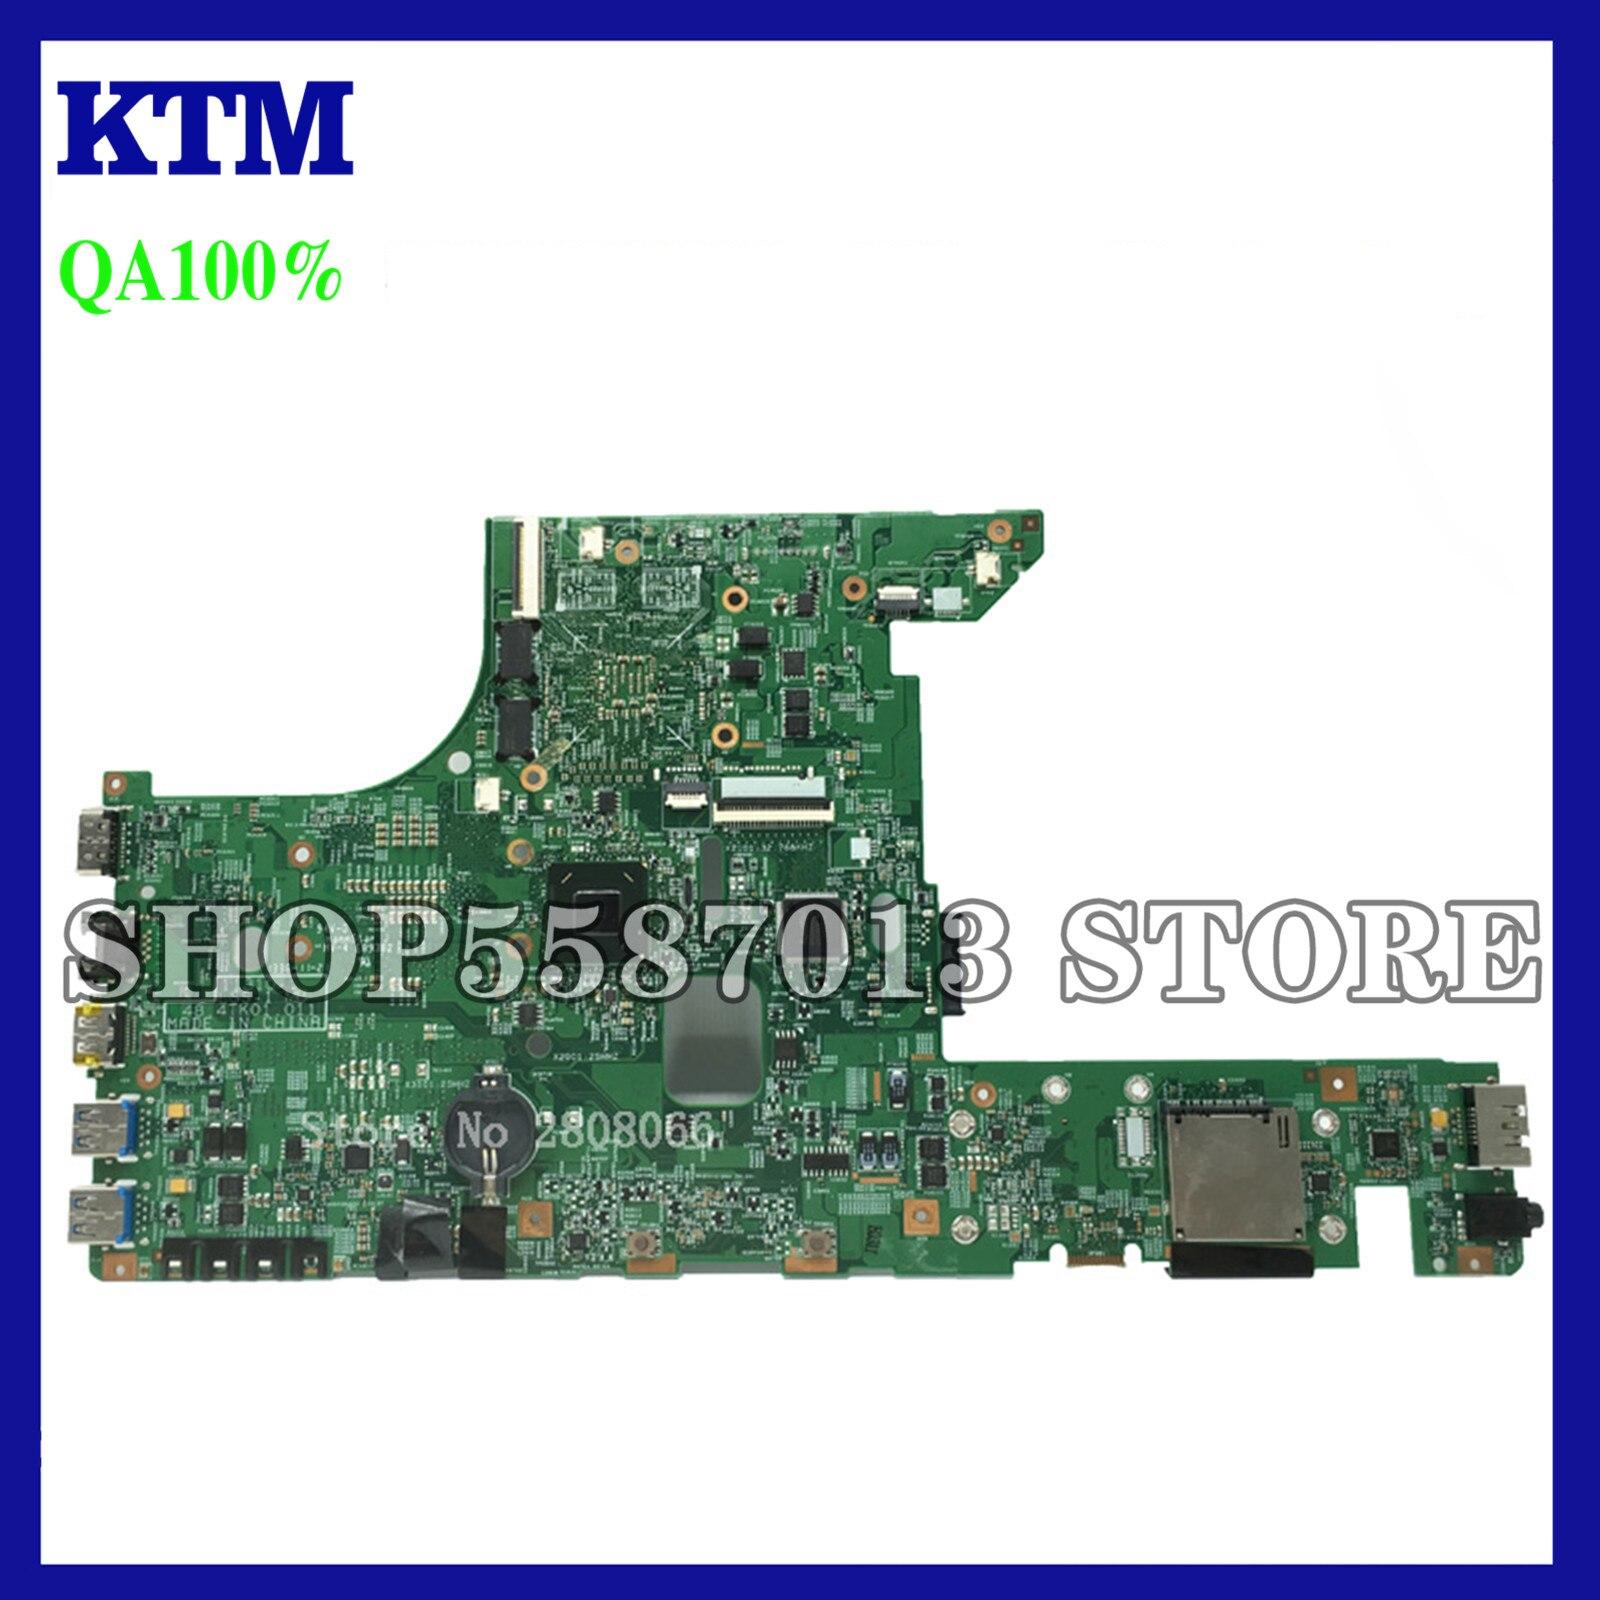 KEFU 11310-1 Test Motherboard For Lenovo E49 E49A E49G Laptop Motherboard 11310-1 48.4TK01.011 Motherboard original teste